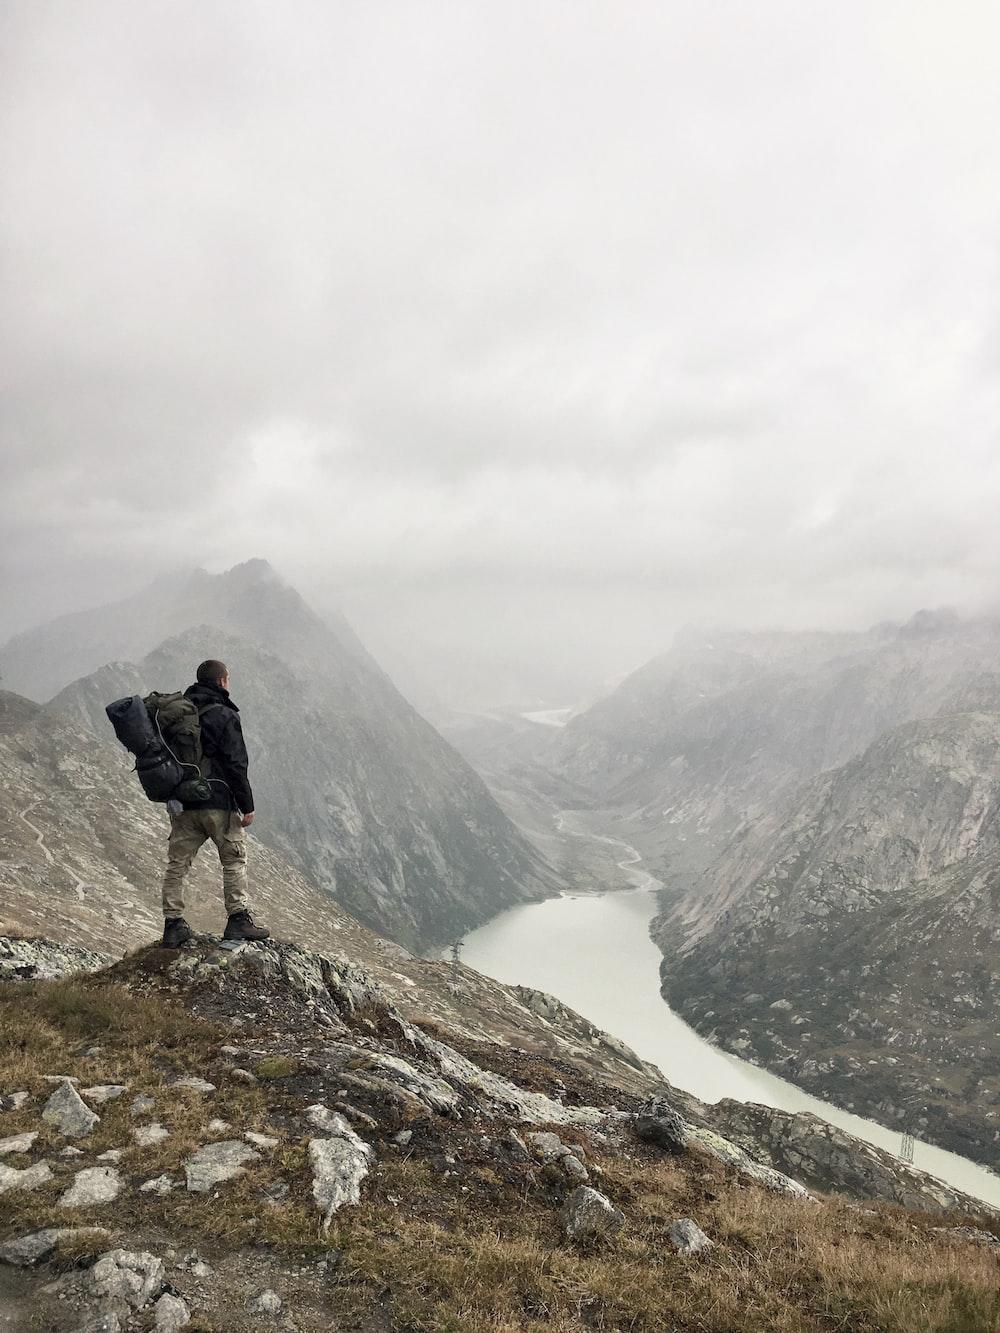 man standing on rock boulder